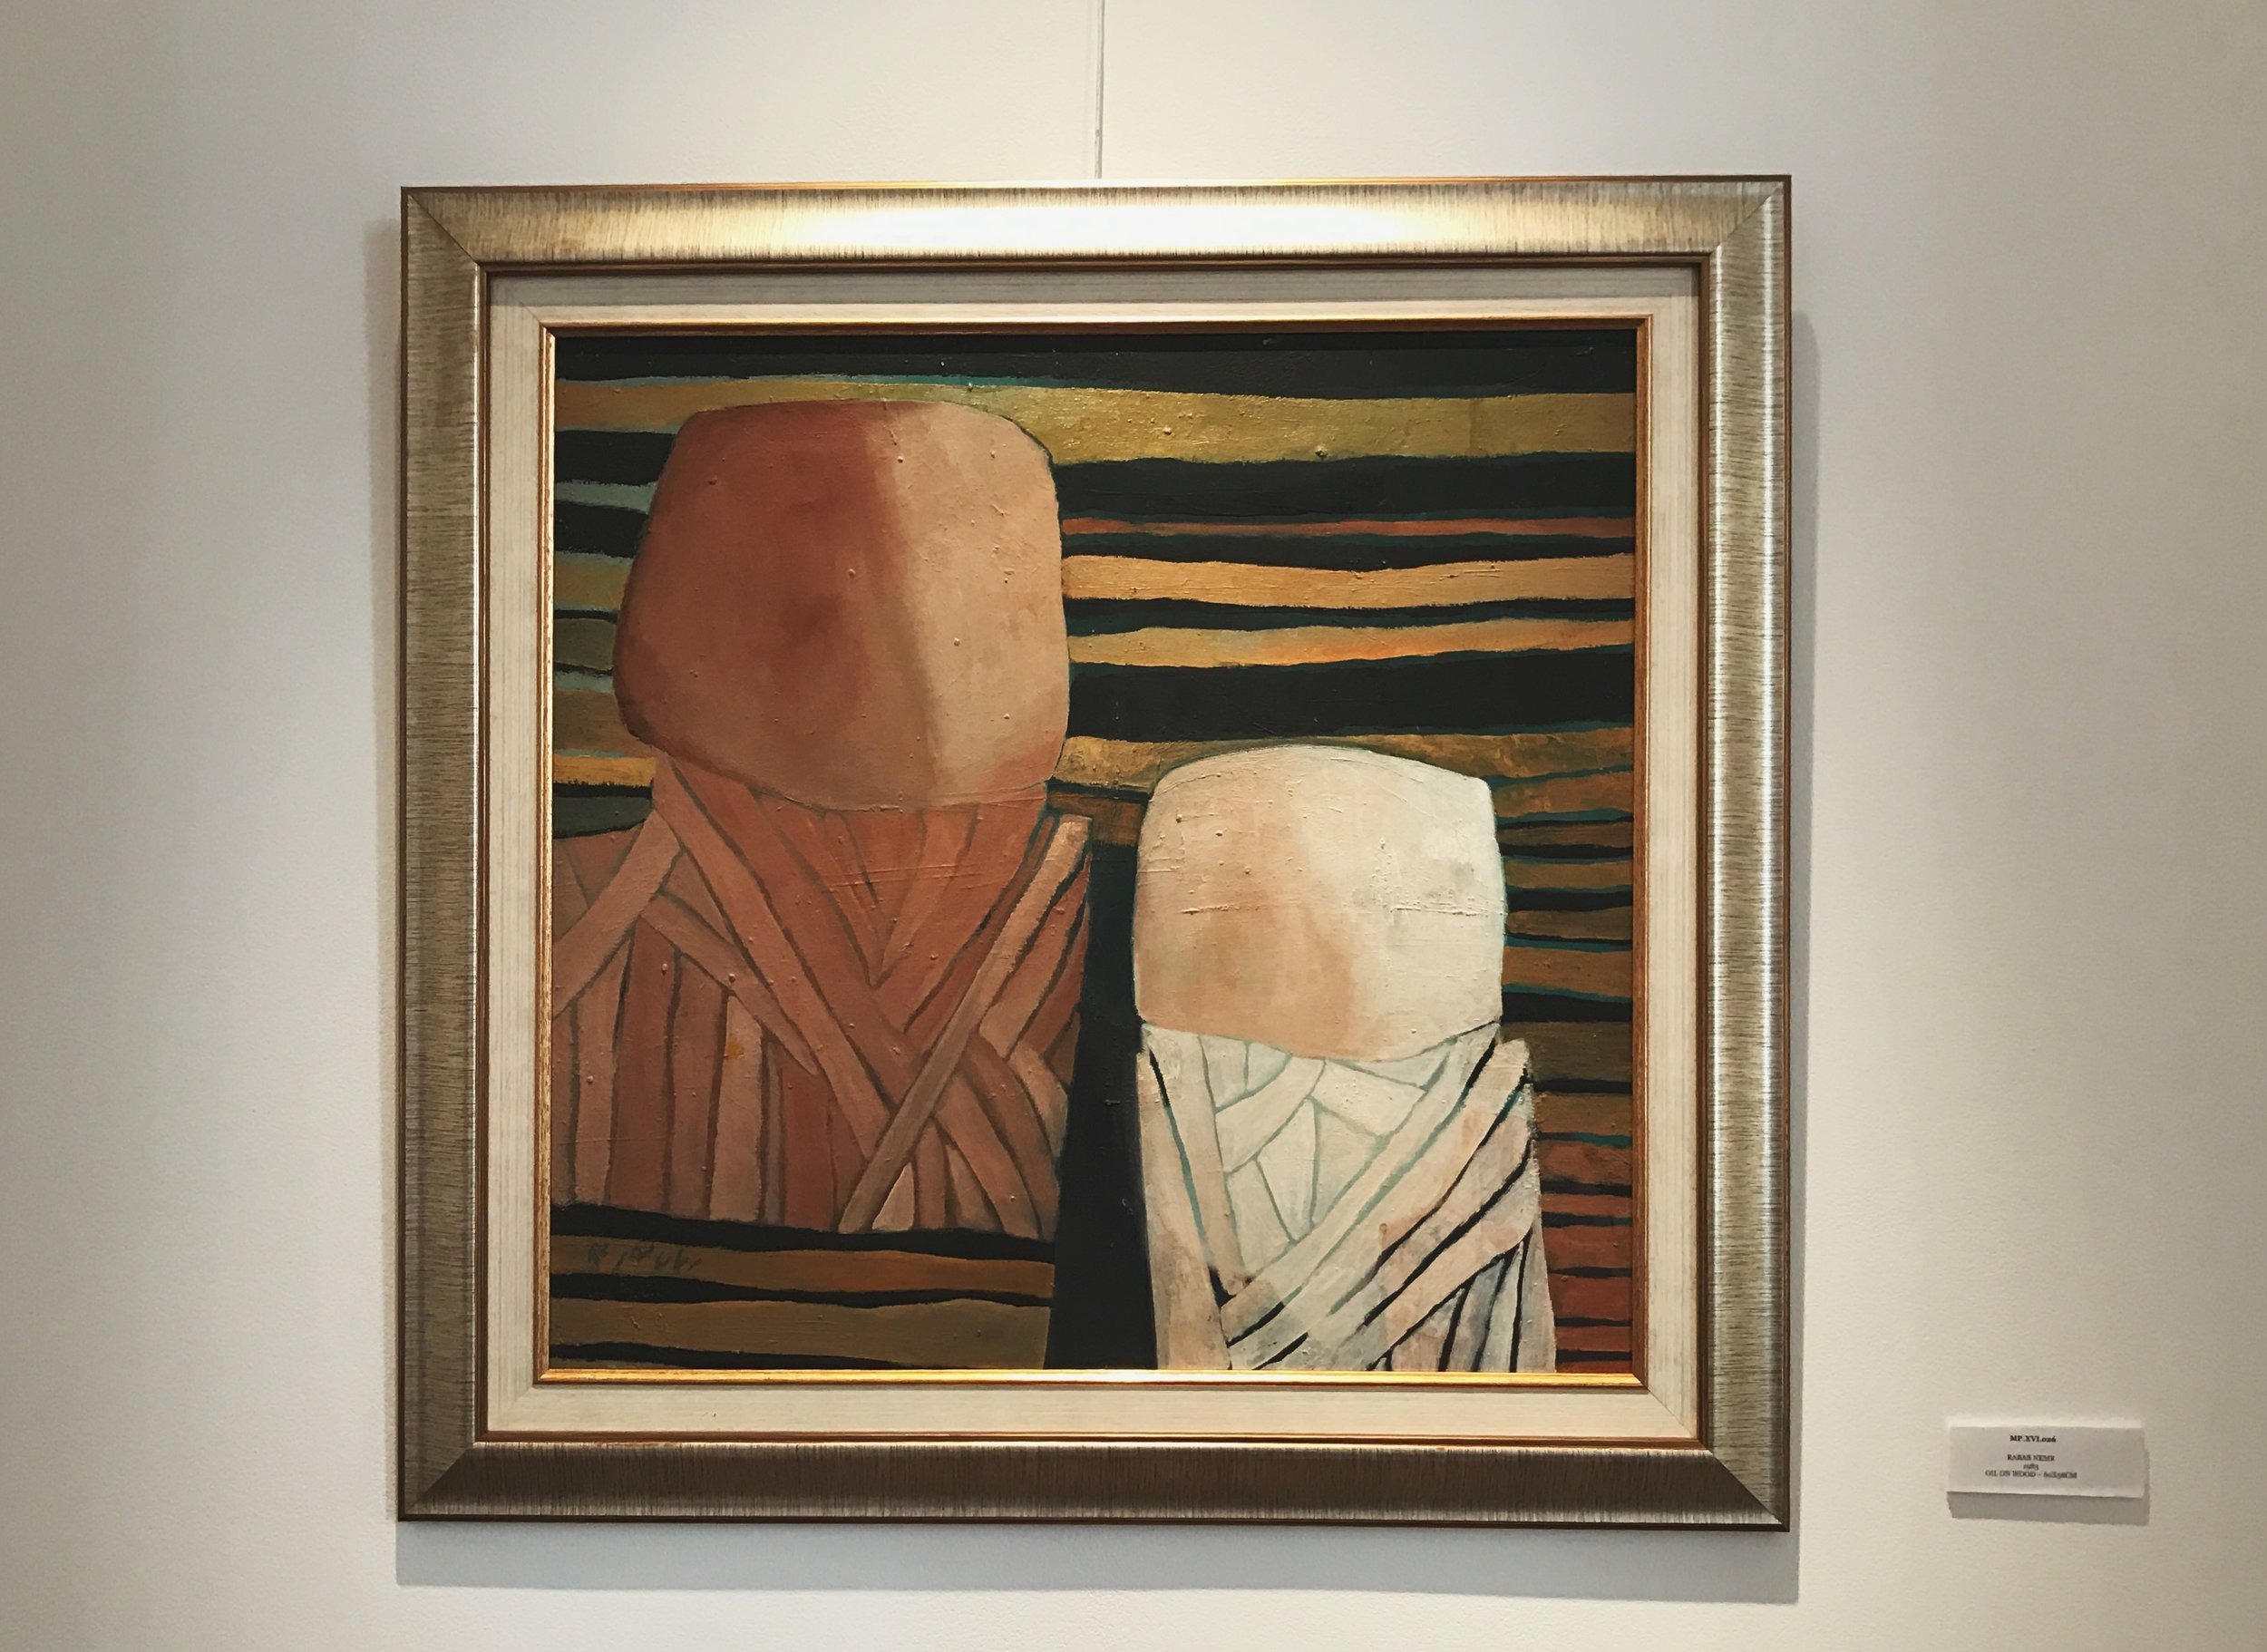 Rabab Nemr   Oil on wood  60 x 58 cm  1983